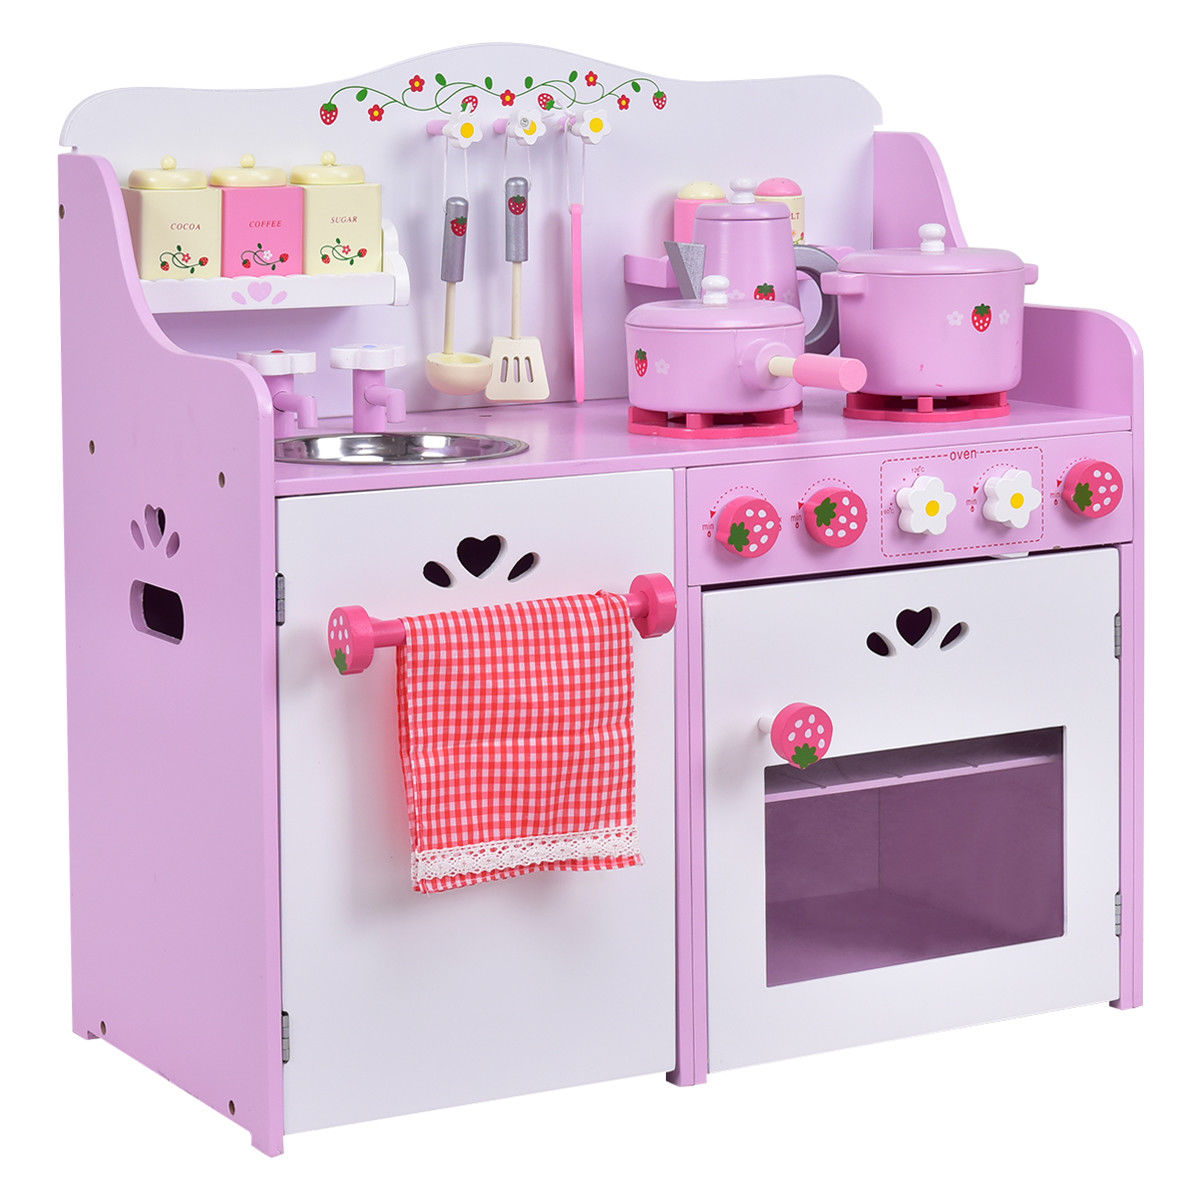 Costway Kids Wooden Play Set Kitchen Toy Strawberry Pretend Cooking